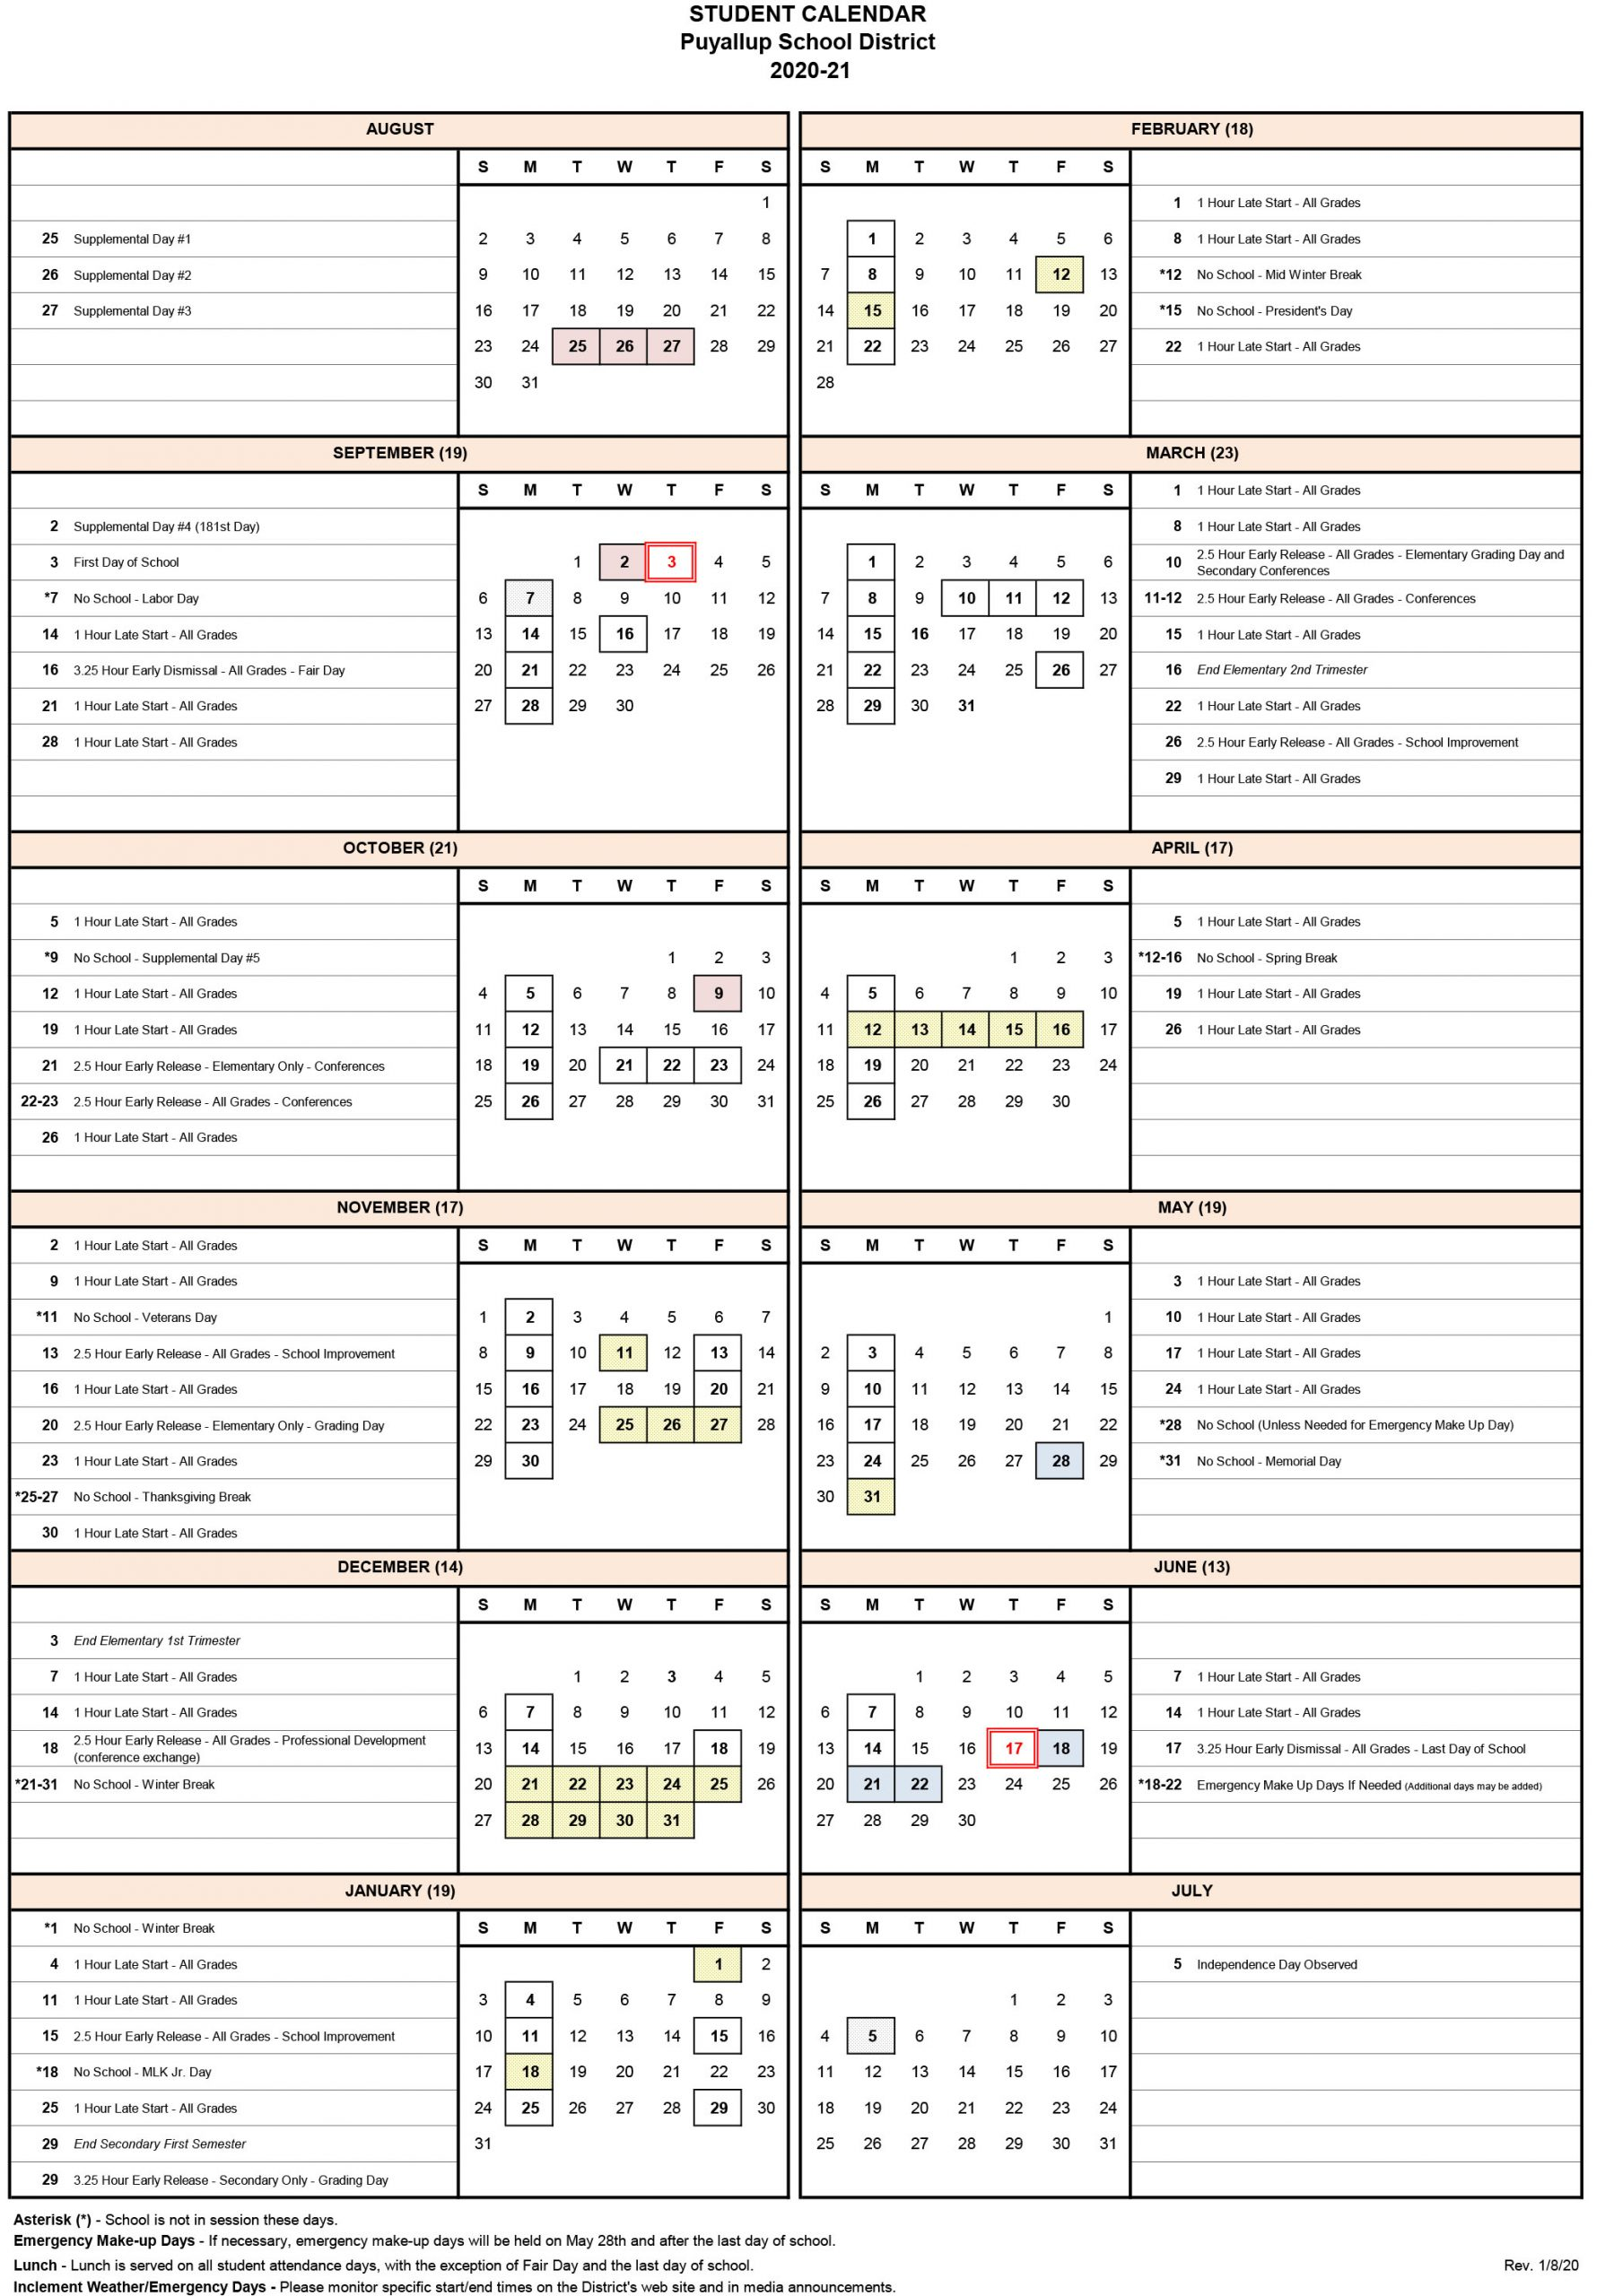 Ny Times Editorial Calendar | Printable Calendar 2020 2021 Inside Las Cruces School District Calendar 2020 2021